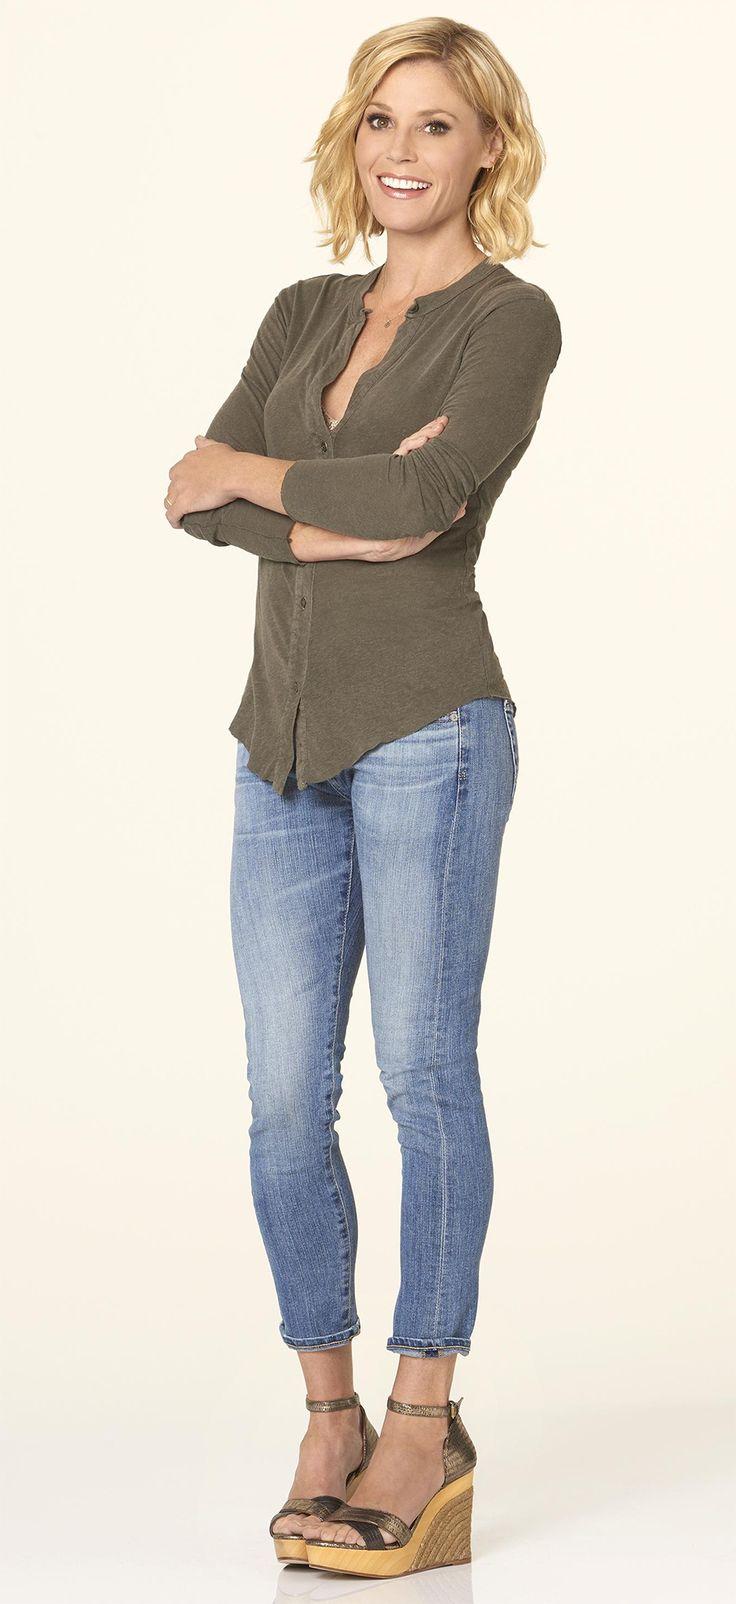 1000+ ideas about Modern Family Season 4 on Pinterest Modern ... - ^